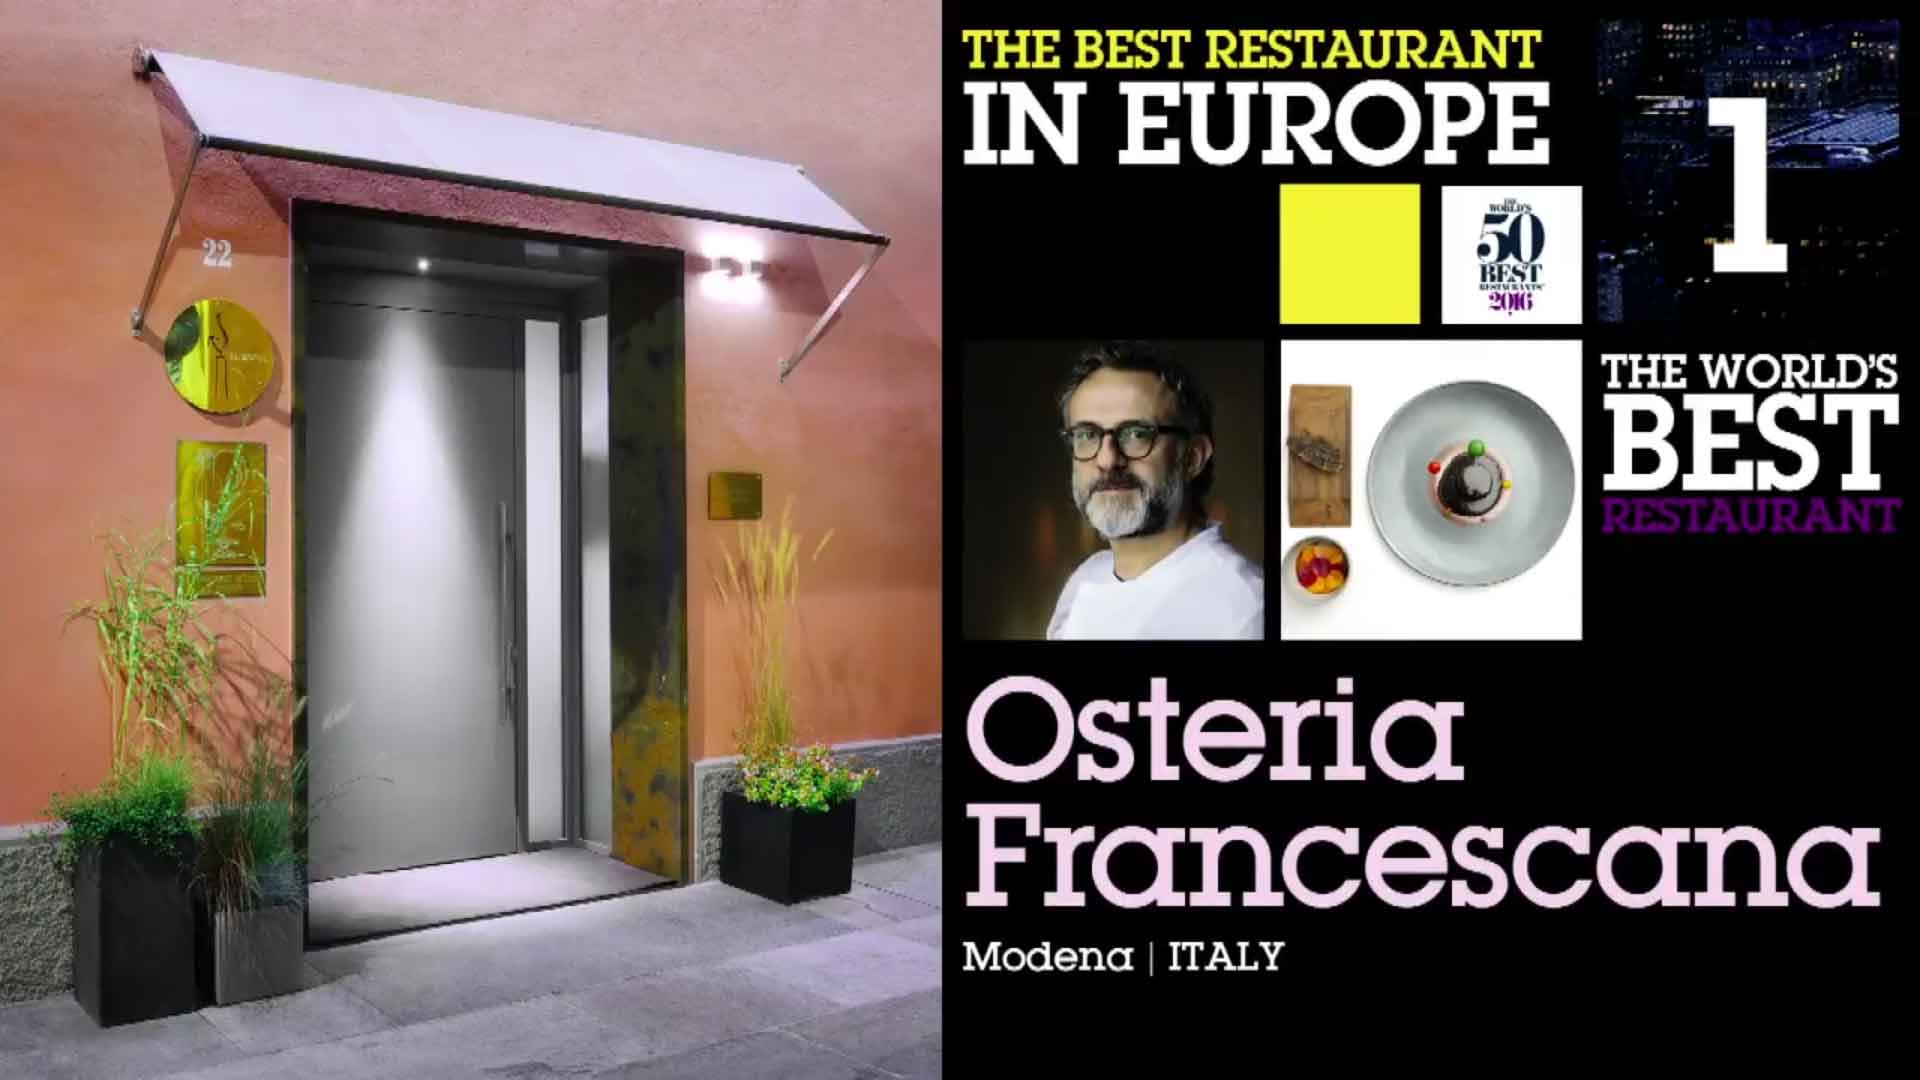 50 Best Restaurants 2016 classifica 1 Massimo Bottura